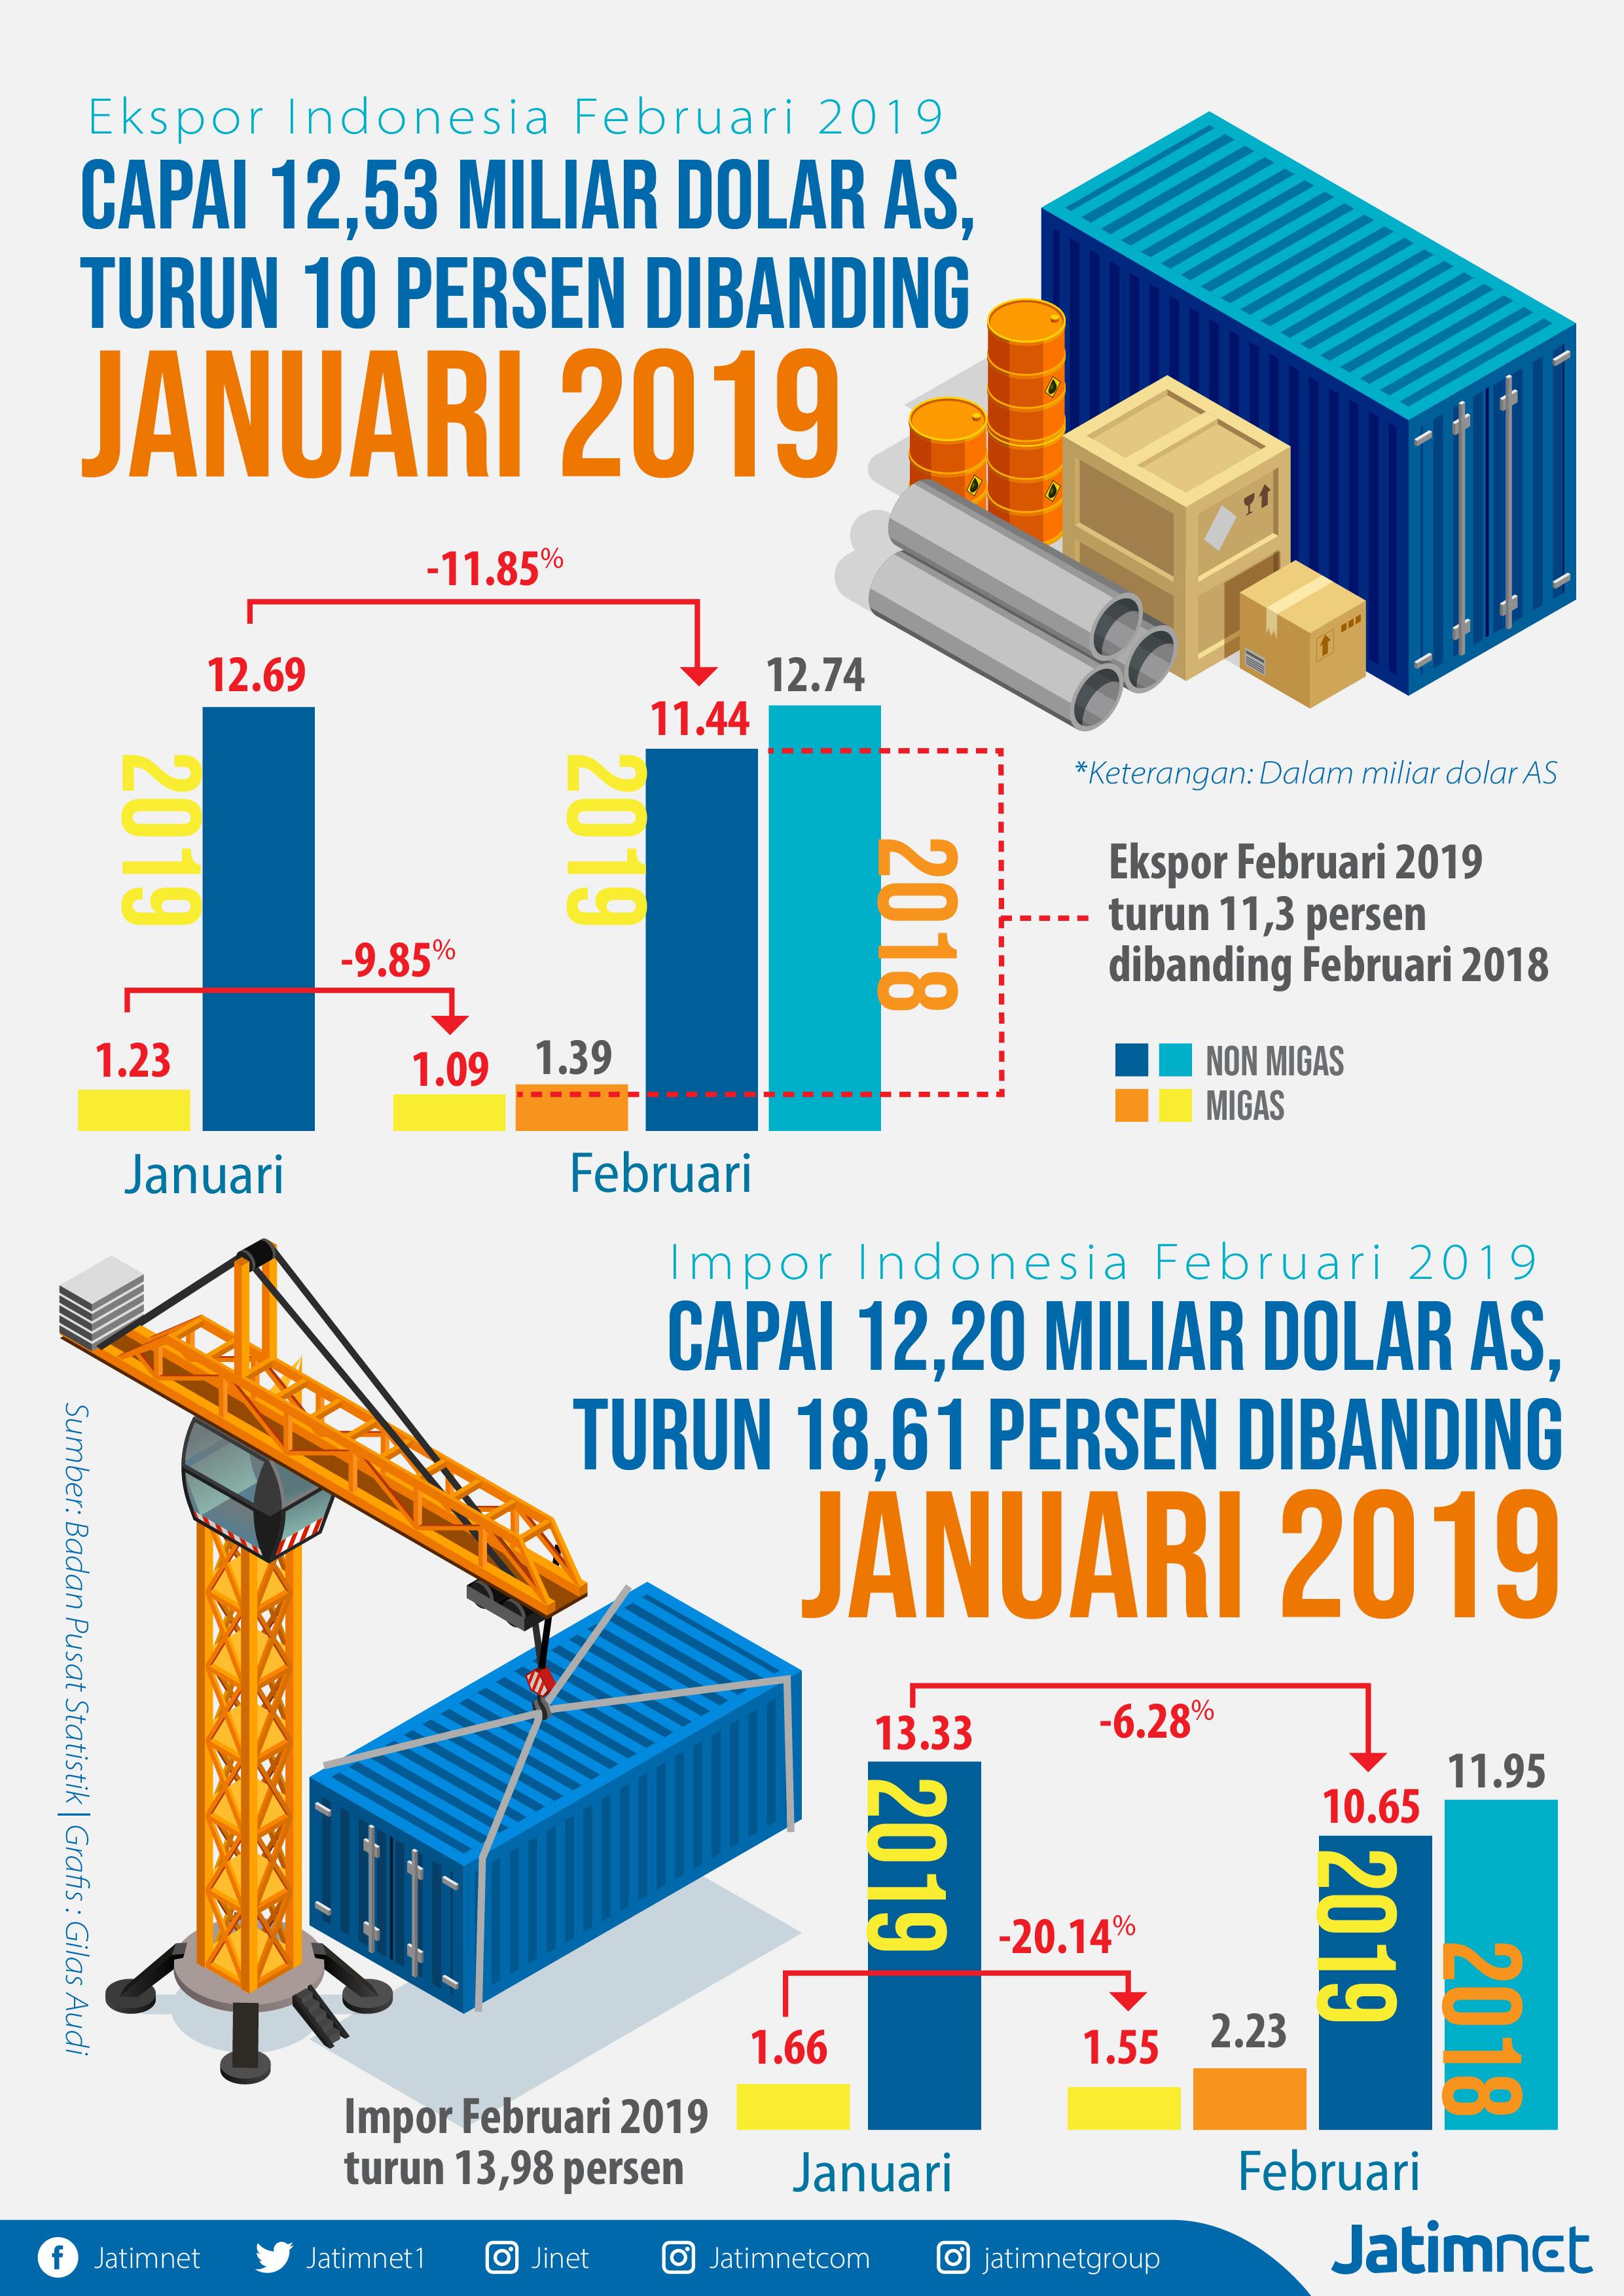 Neraca Perdagangan Indonesia Surplus 0,33 Miliar Dolar AS